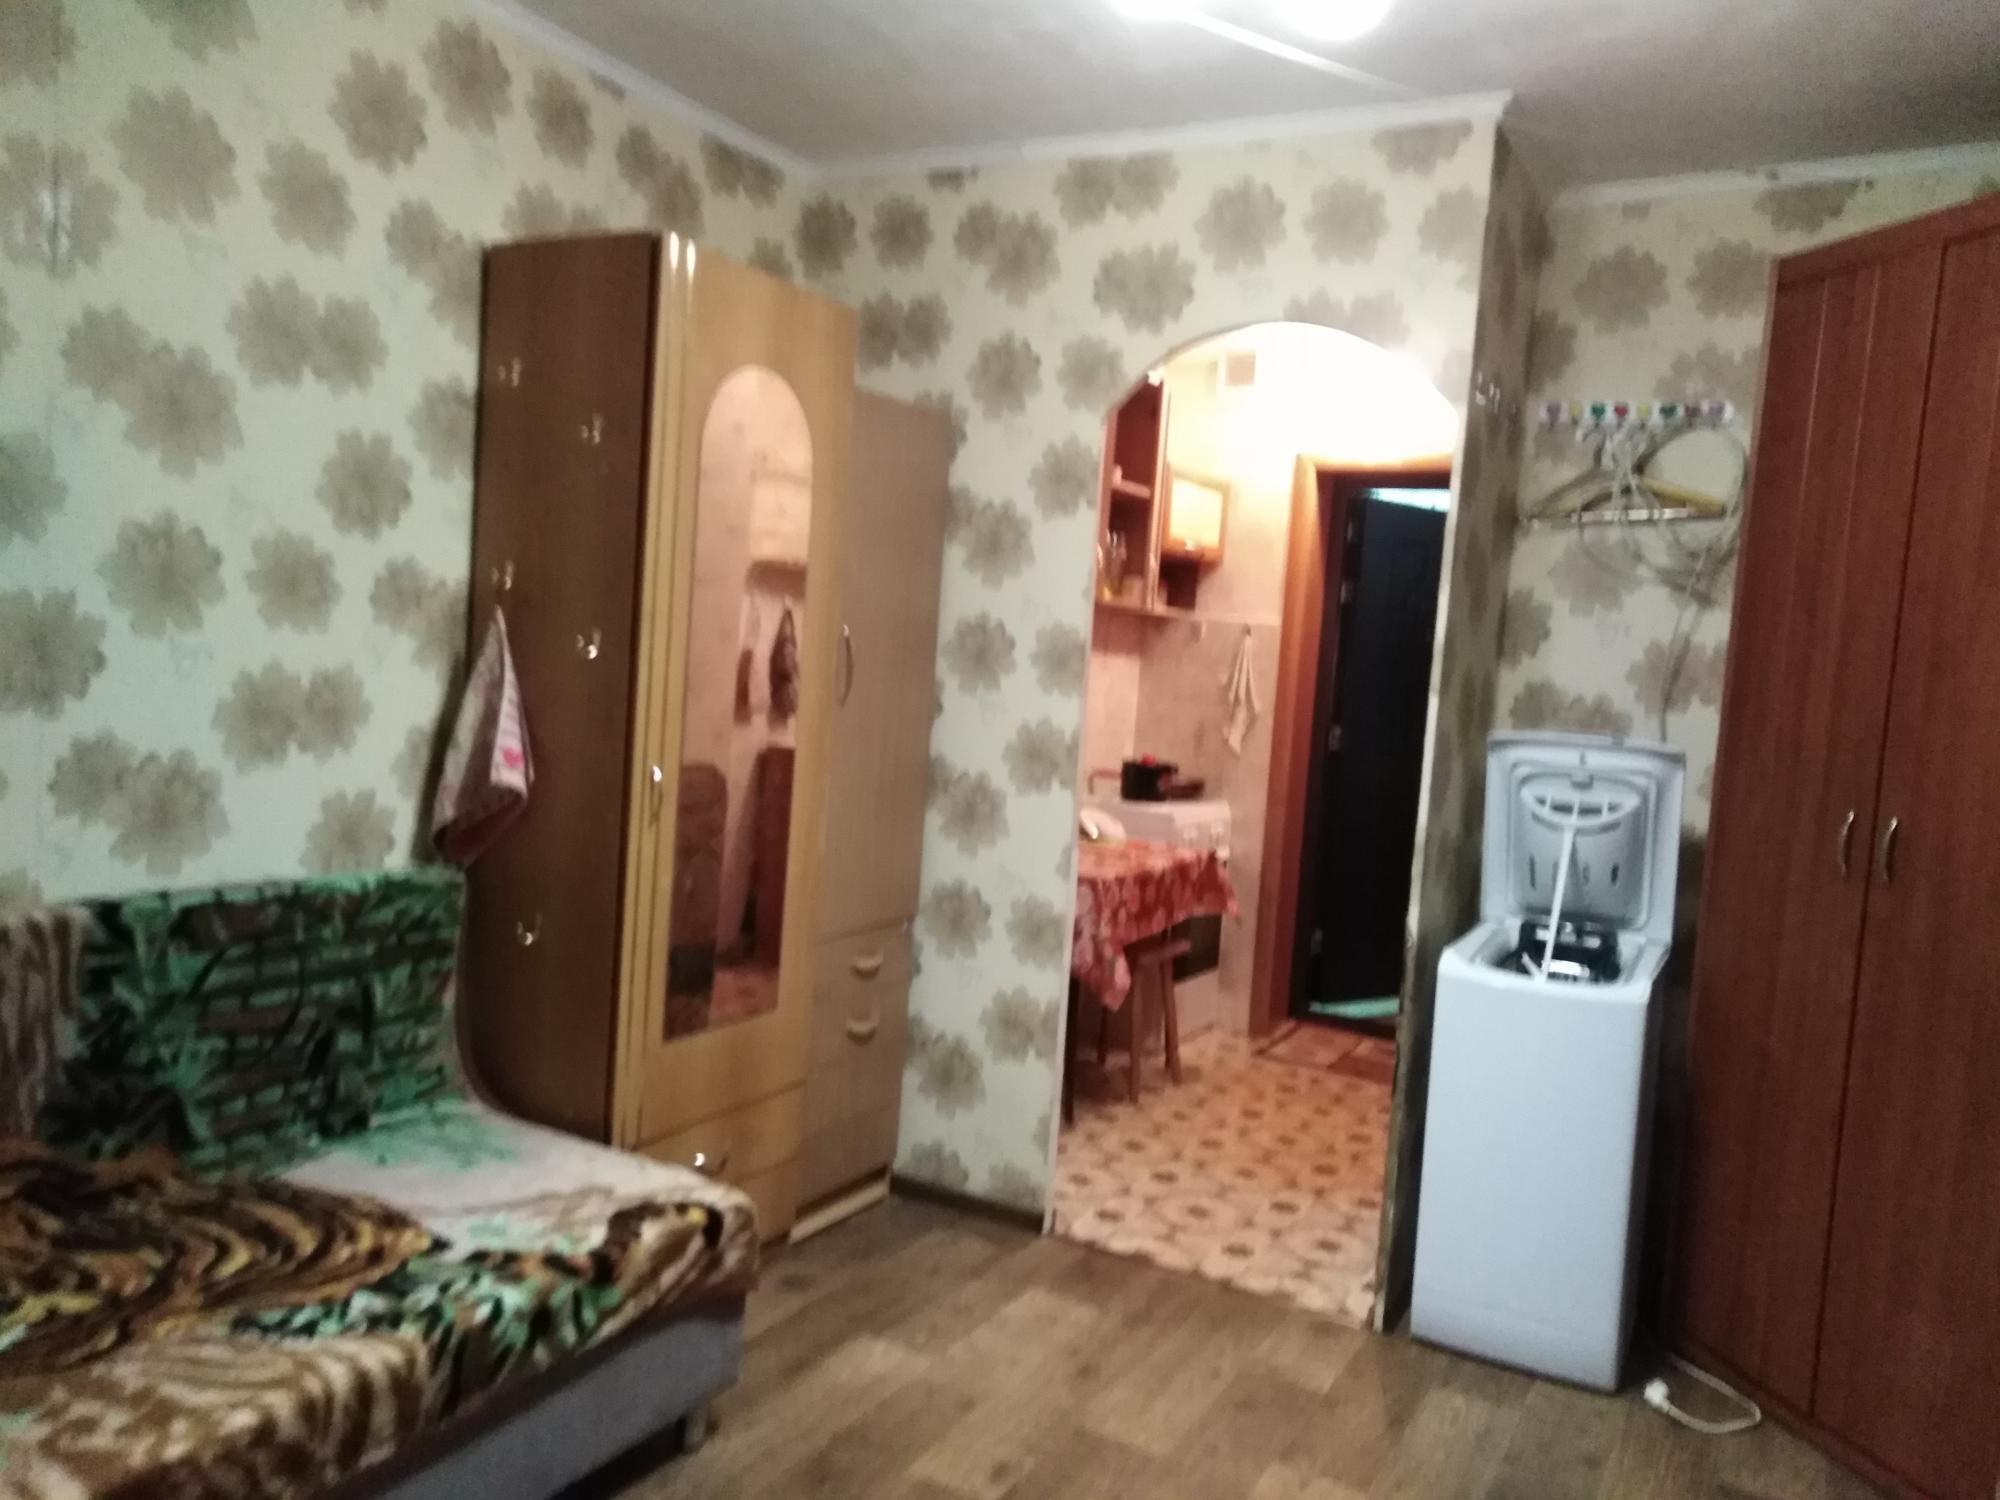 1к квартира улица Семафорная, 257 | 10500 | аренда в Красноярске фото 2